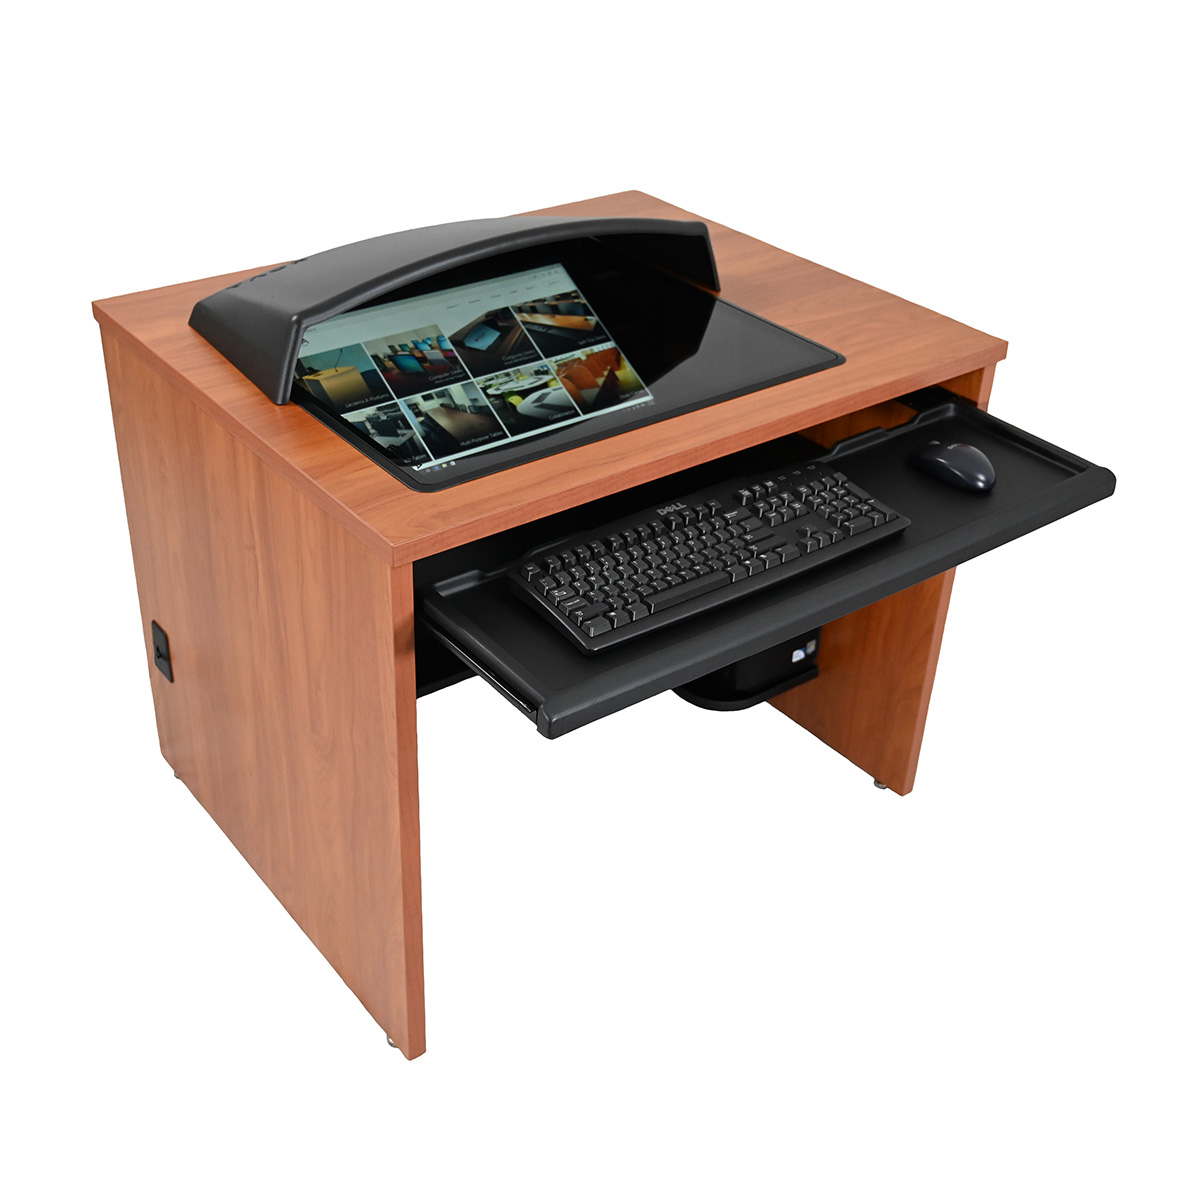 Computer Training Desks Downview, Downview Recessed Monitor Computer Desks